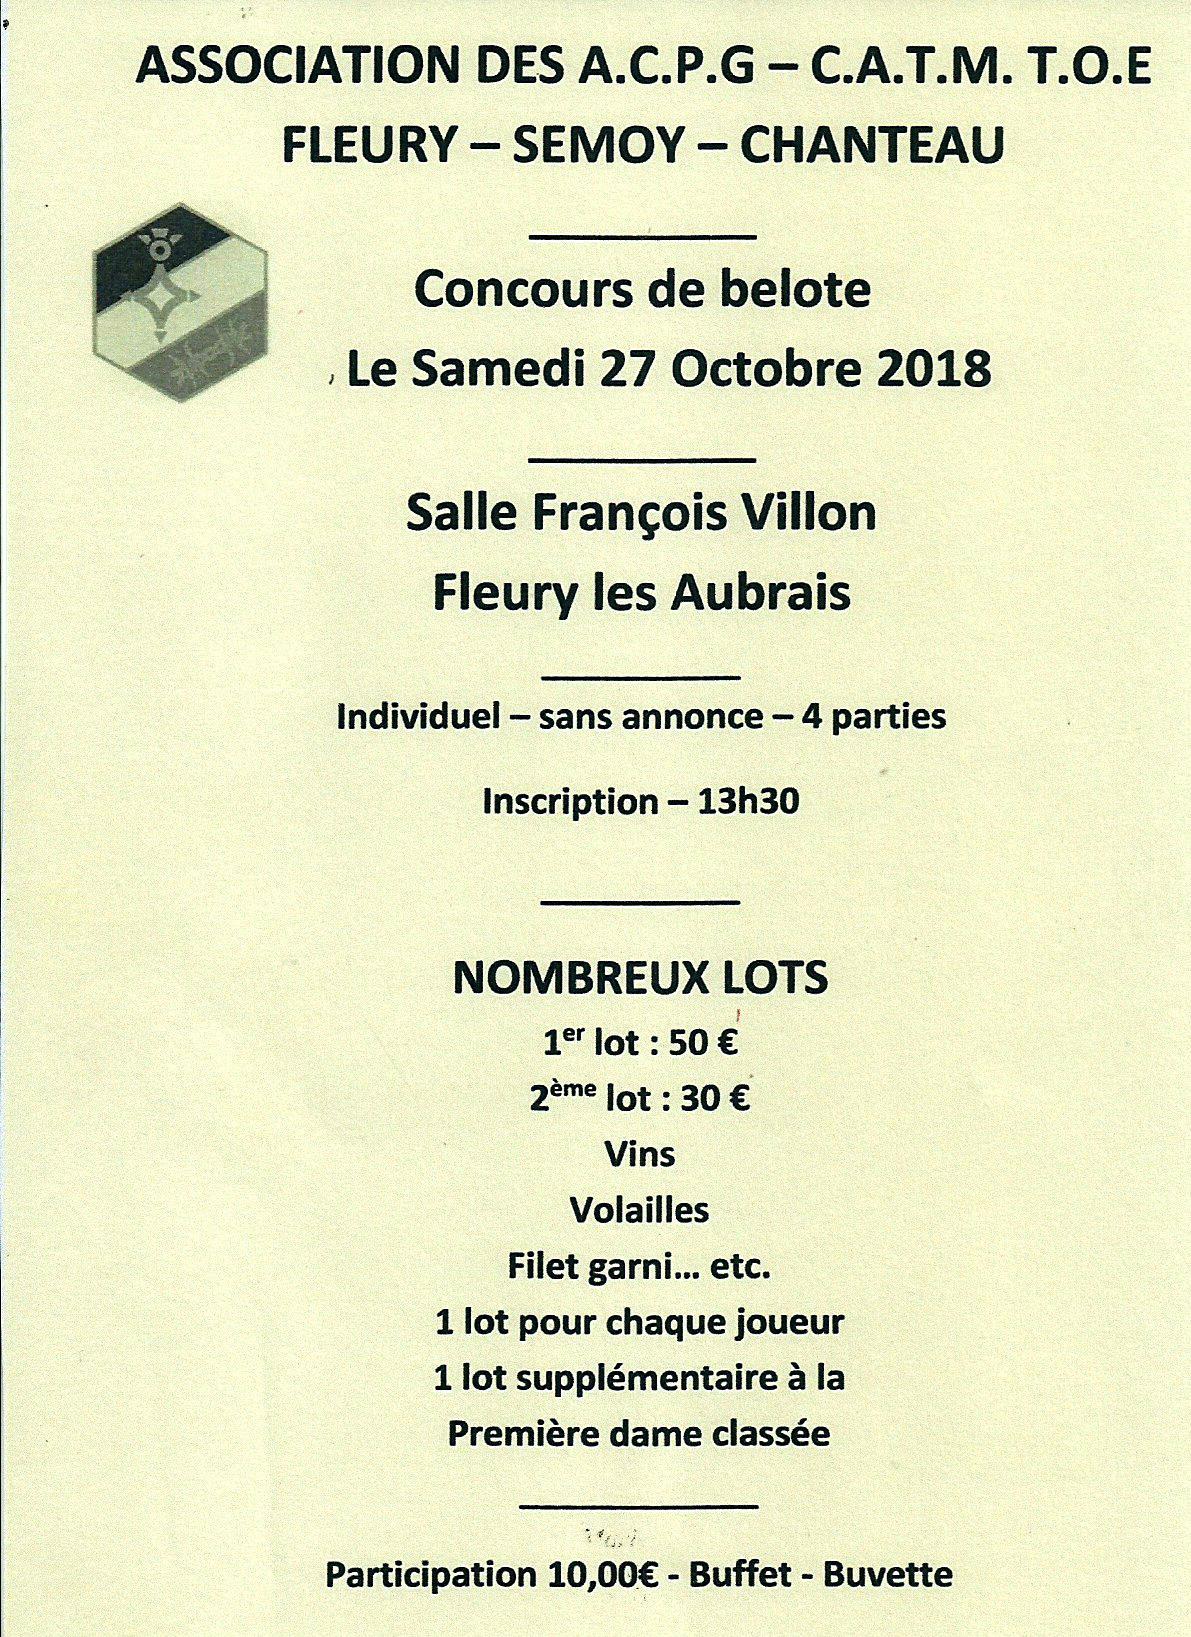 Scan Affiche Concours de Belote 2018 A.C.P.G-C.A.T.M. T.O.E 201.jpg